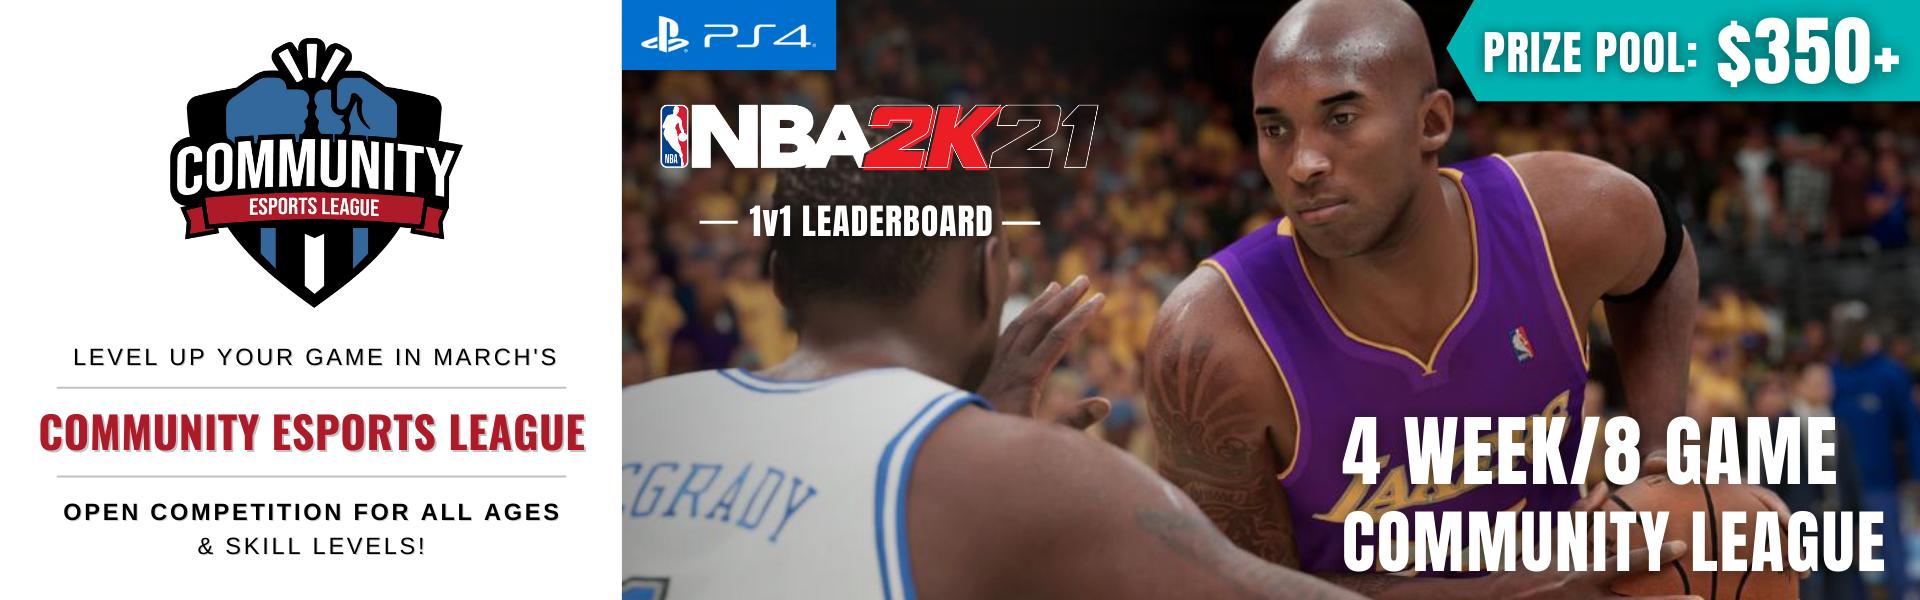 NBA2K21: March – PS4